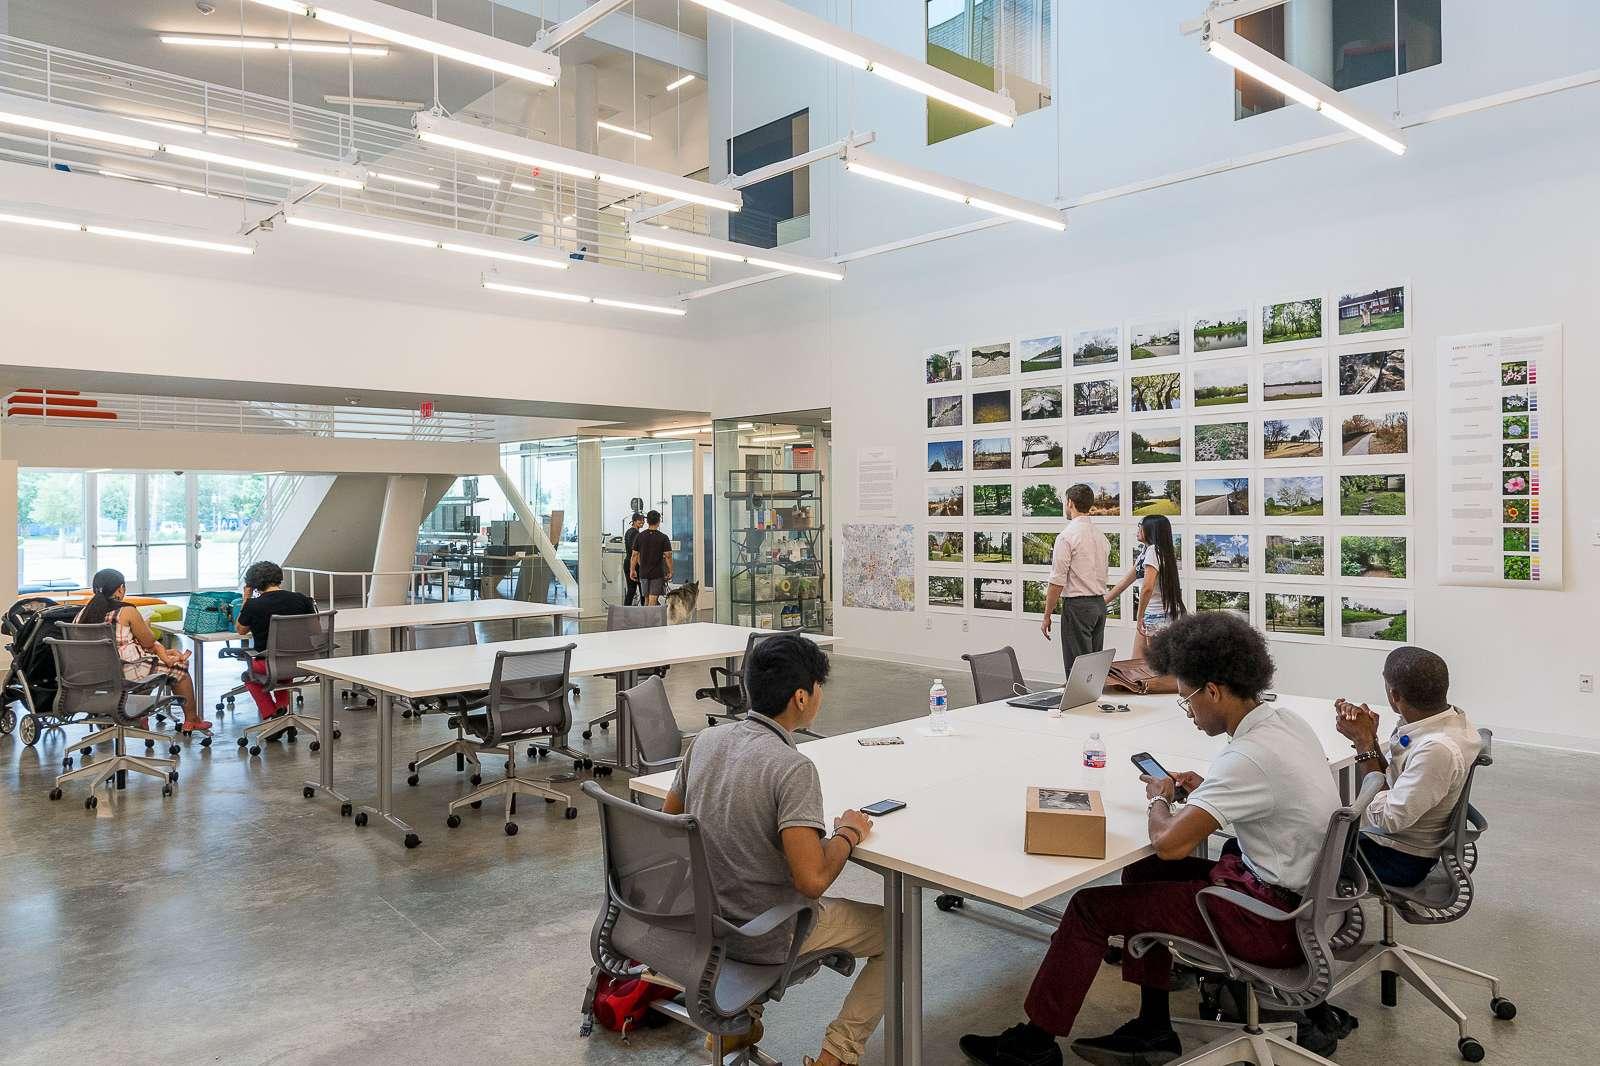 Students in the Creative Open Studio. Photo: Nash Baker.